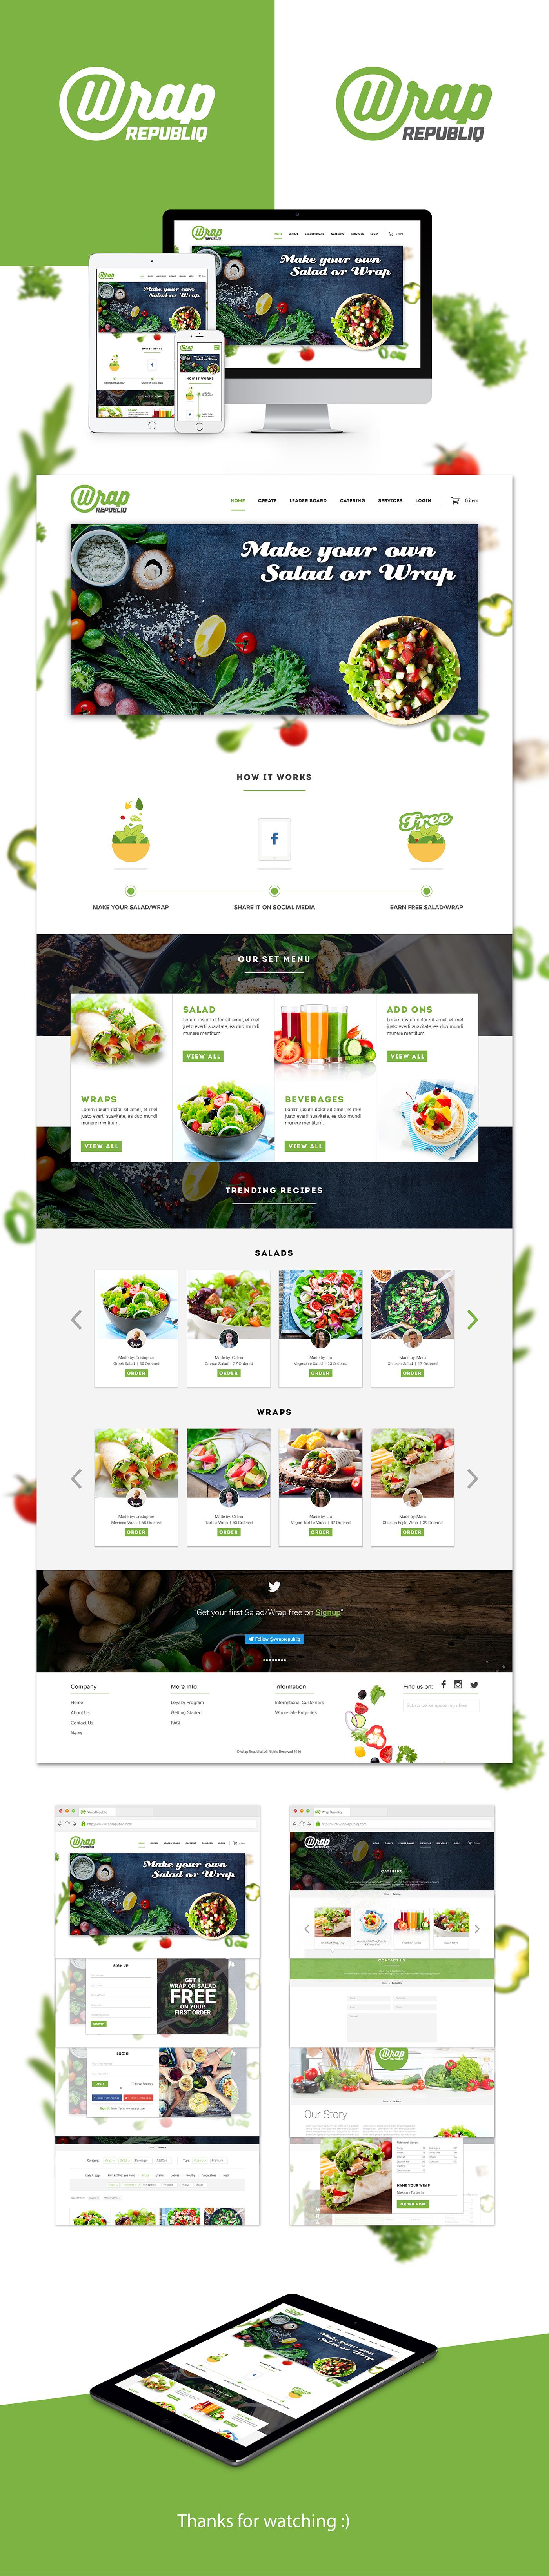 salad food wrap online order healthy vegetables Ecommerce Wrap Republiq Food  delivery customised delicious Logo Design